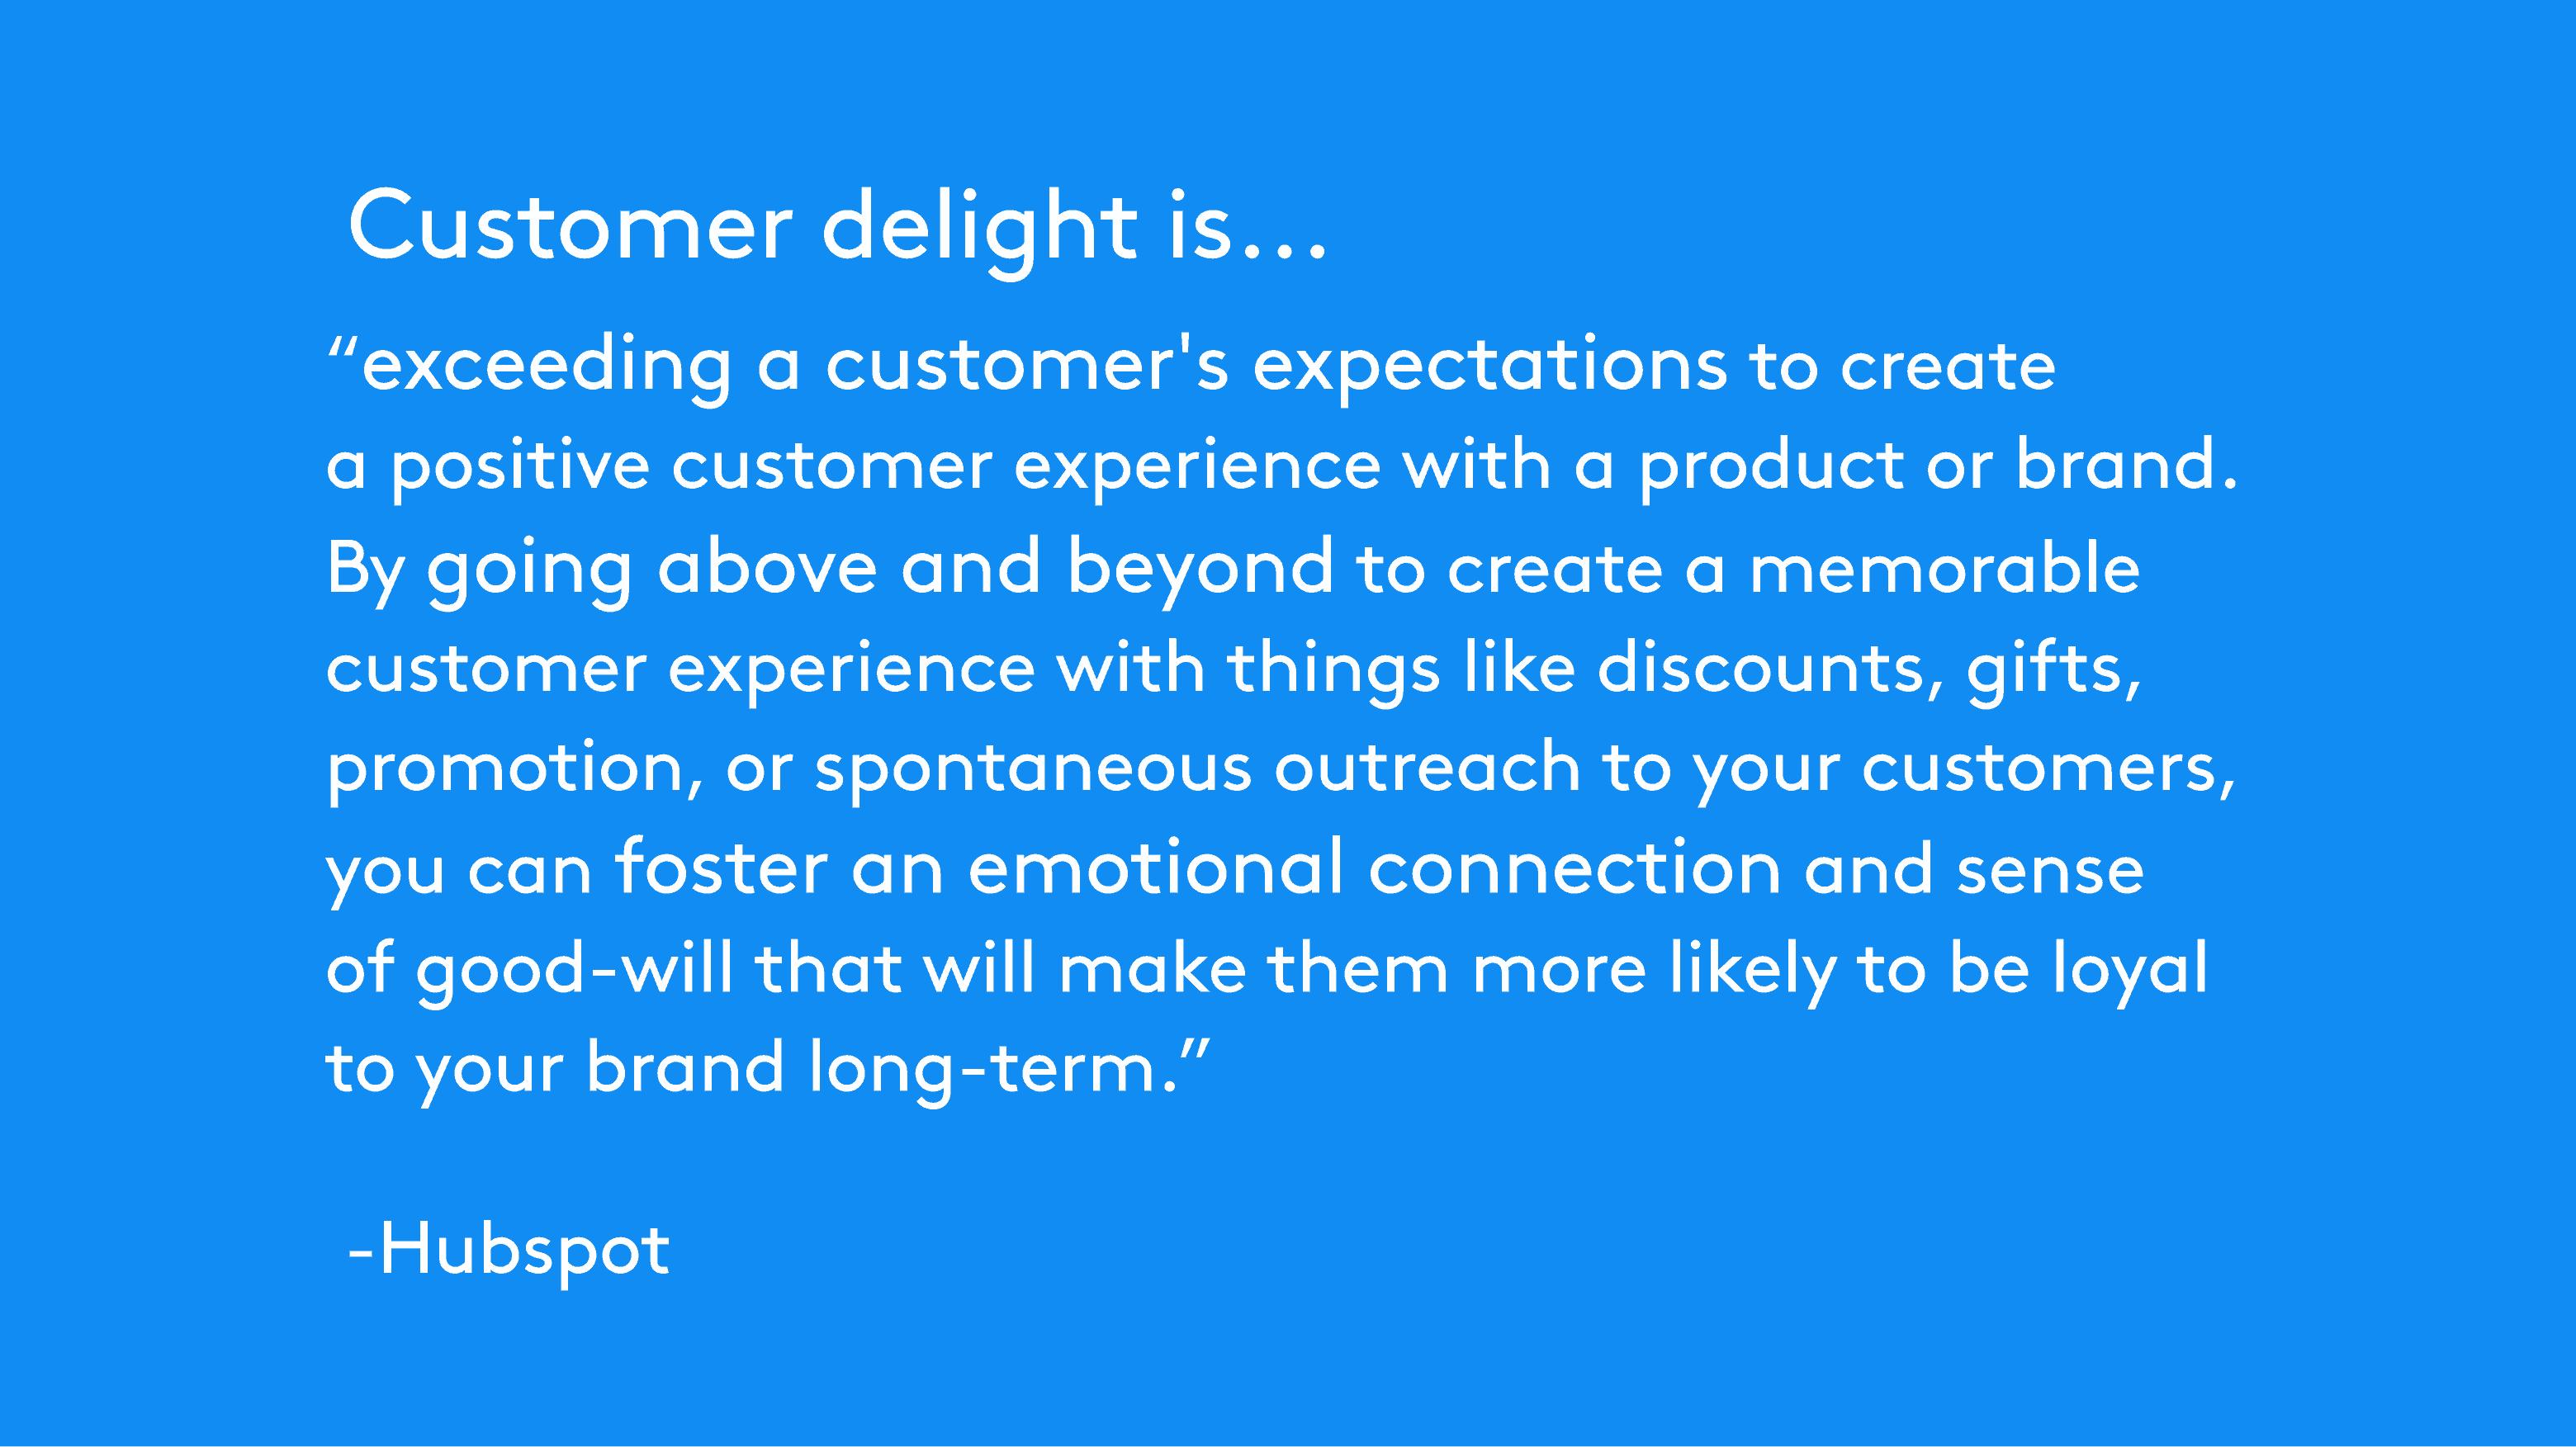 Hubspot about Customer delight